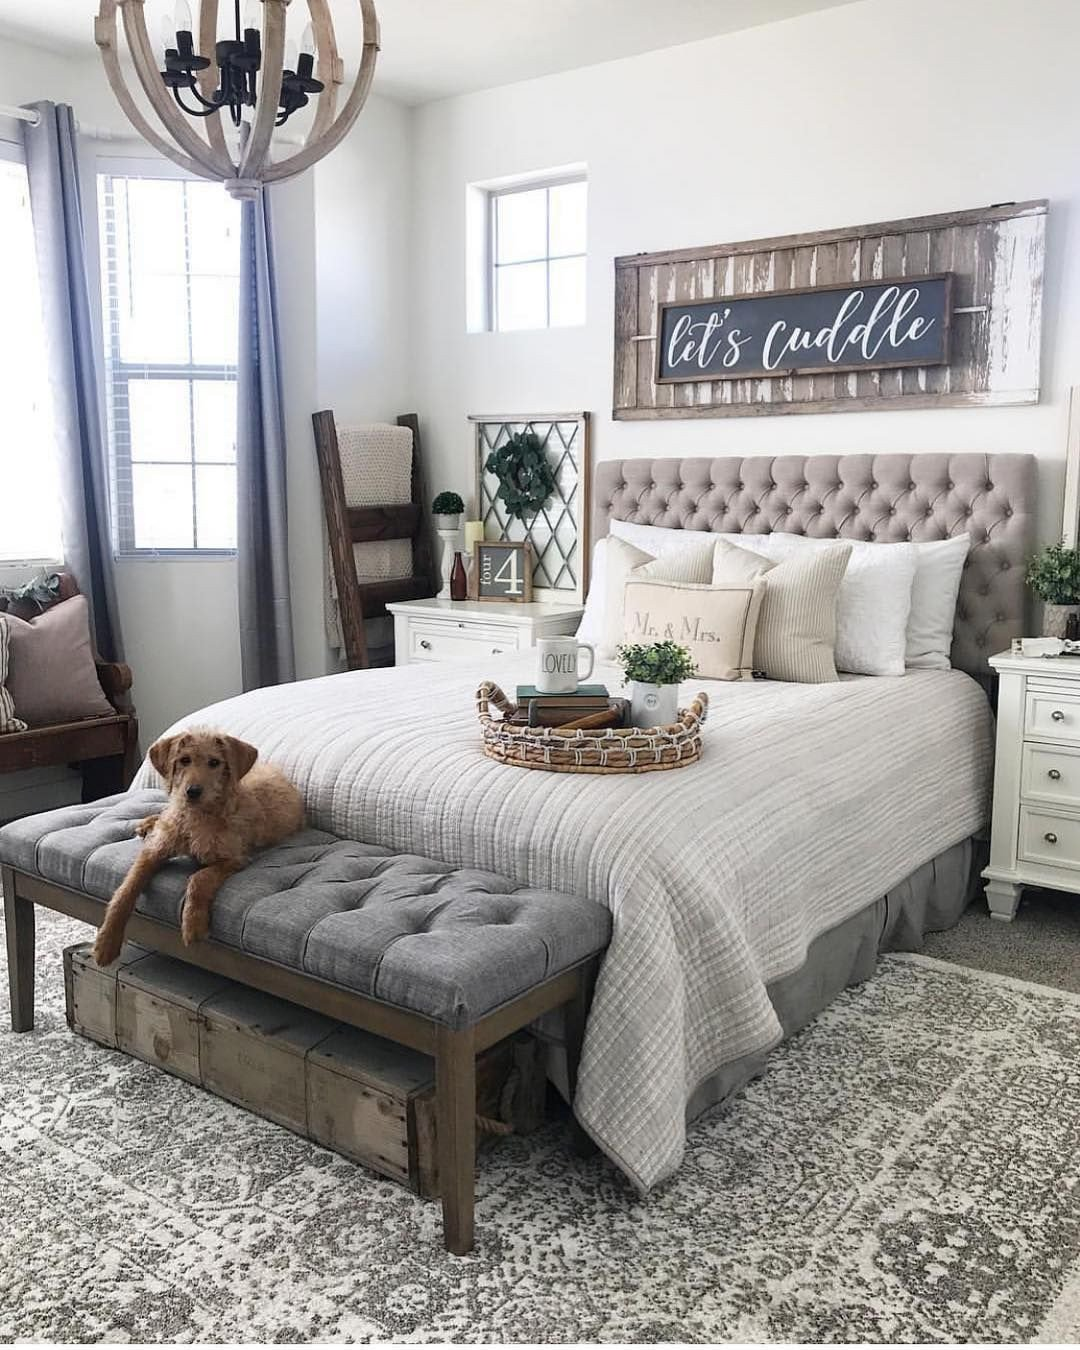 Farmhouse Style Bedroom Set Luxury Stay Cozy It is C❄️ld Outside Love Shandy S Cozy Bedroom